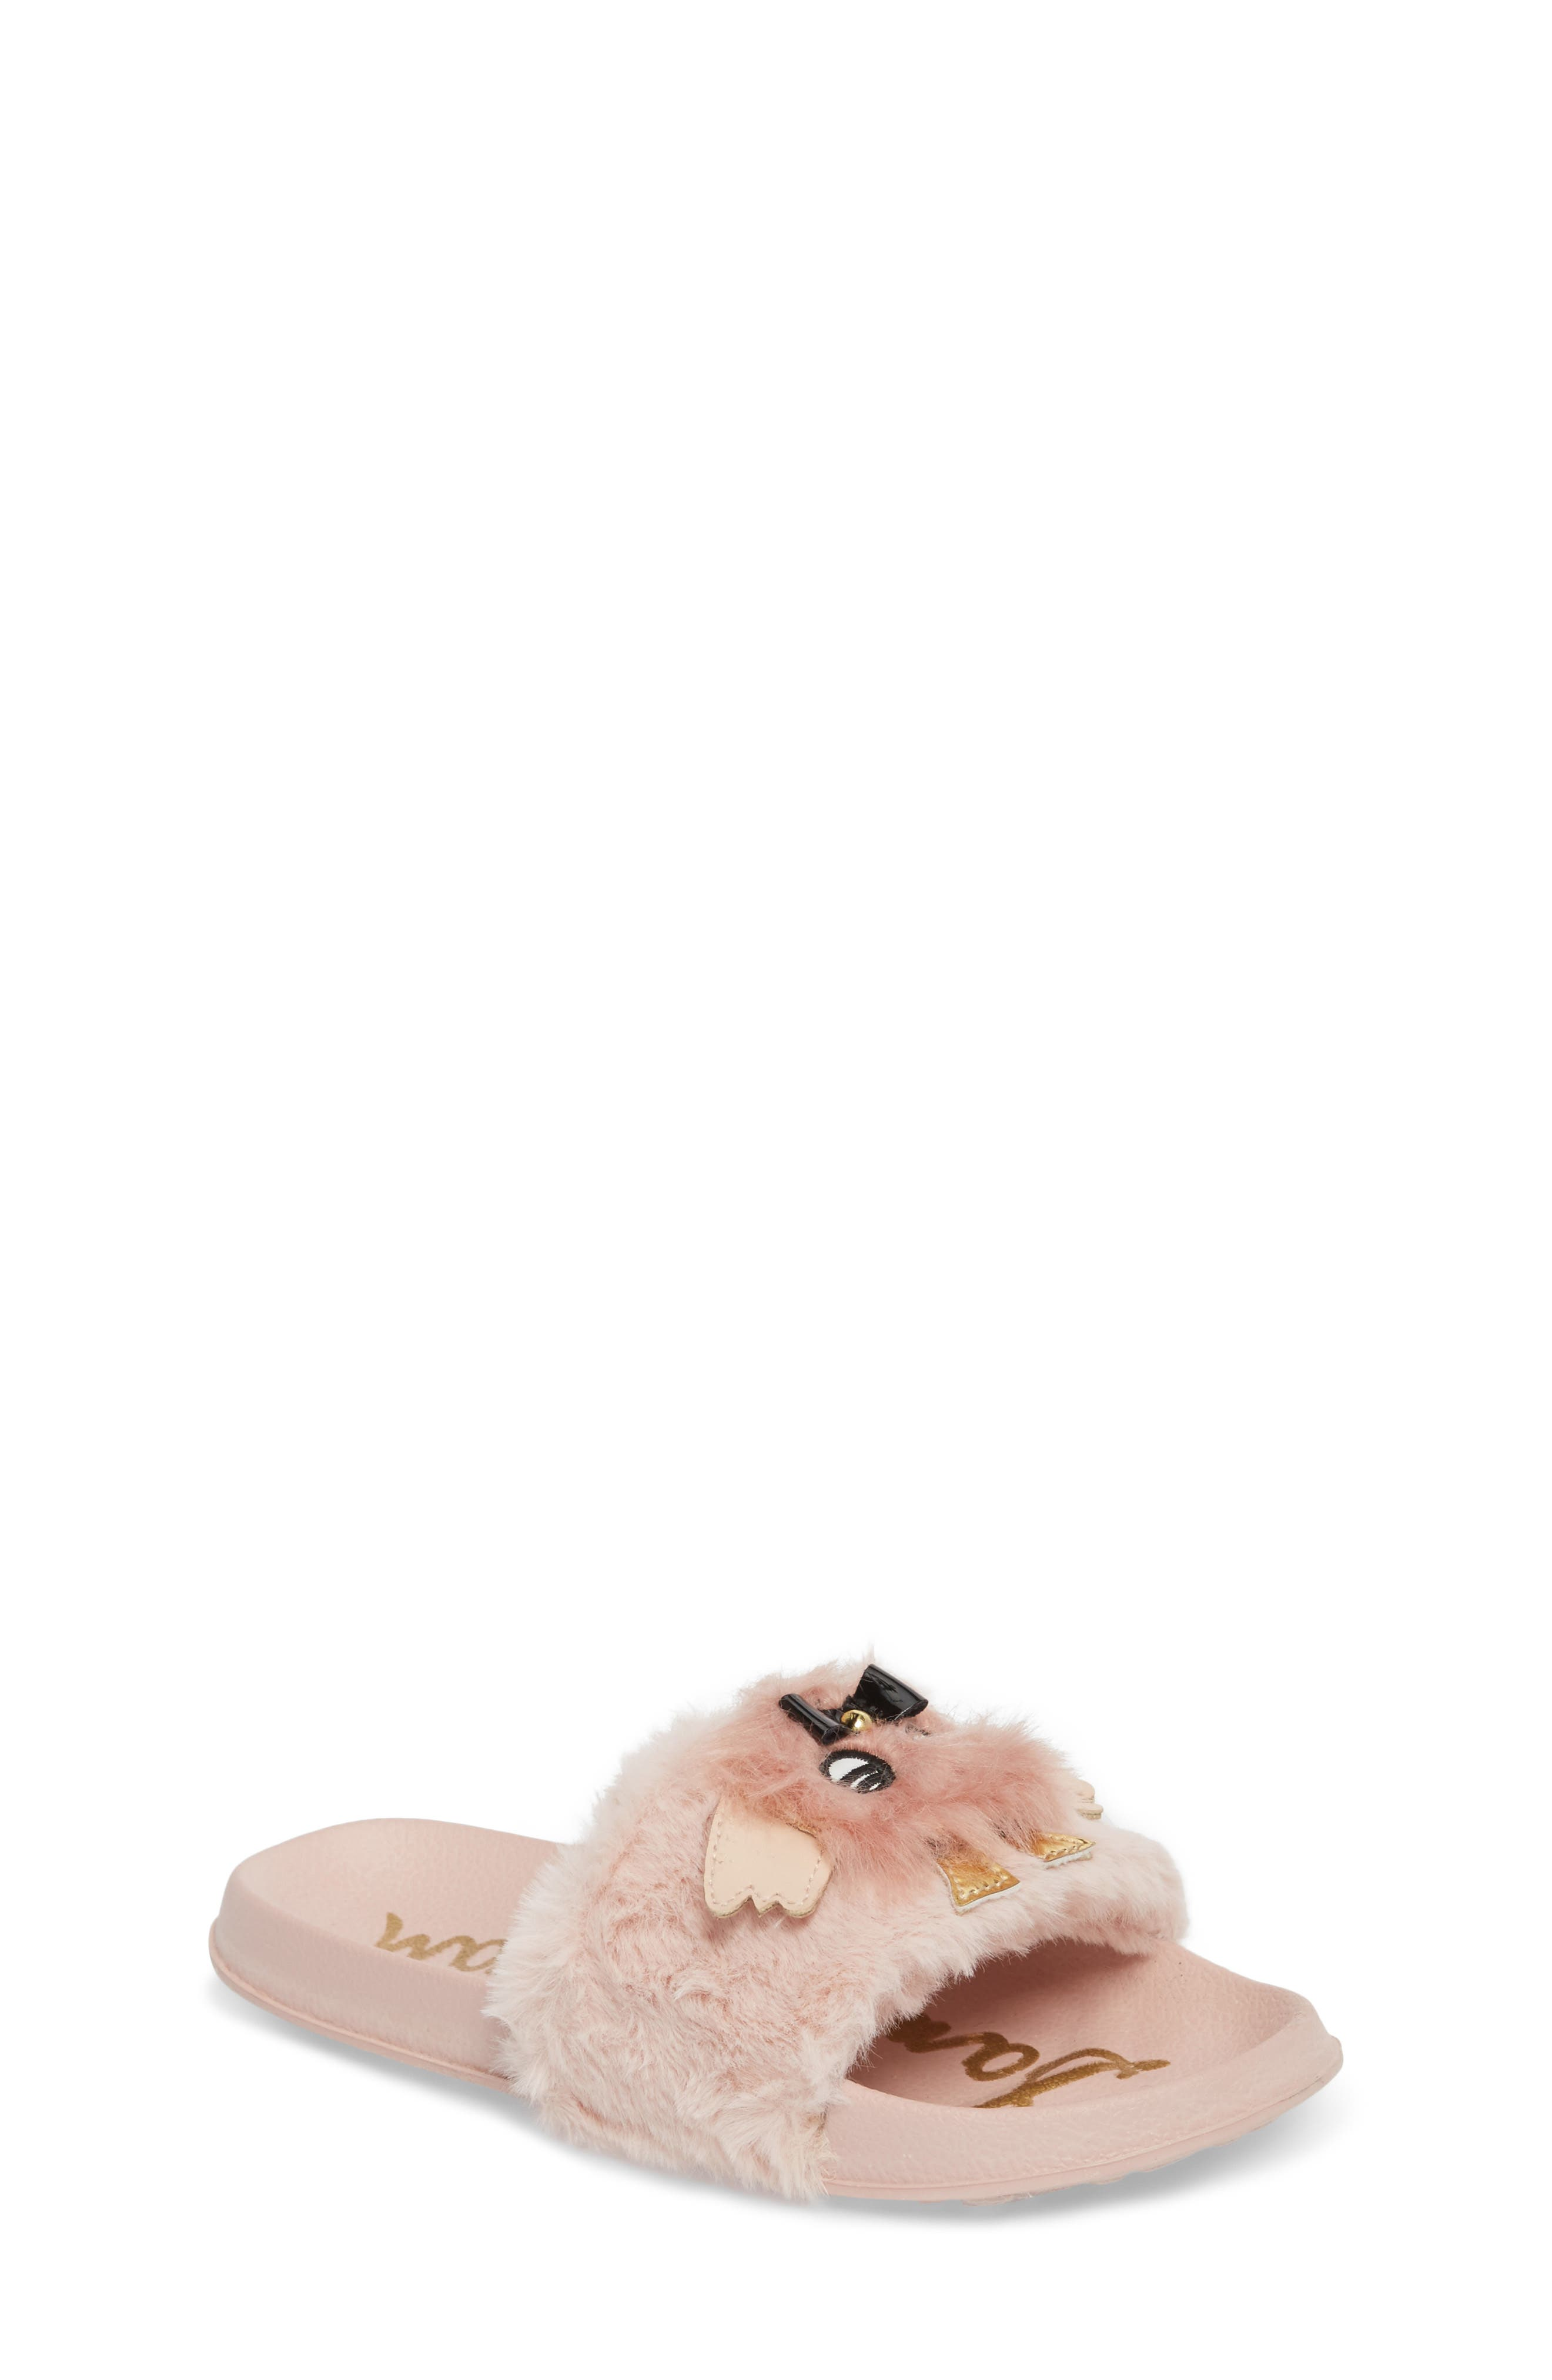 Mackie Furry Faux Fur Slide Sandal,                             Main thumbnail 1, color,                             Blush Faux Fur